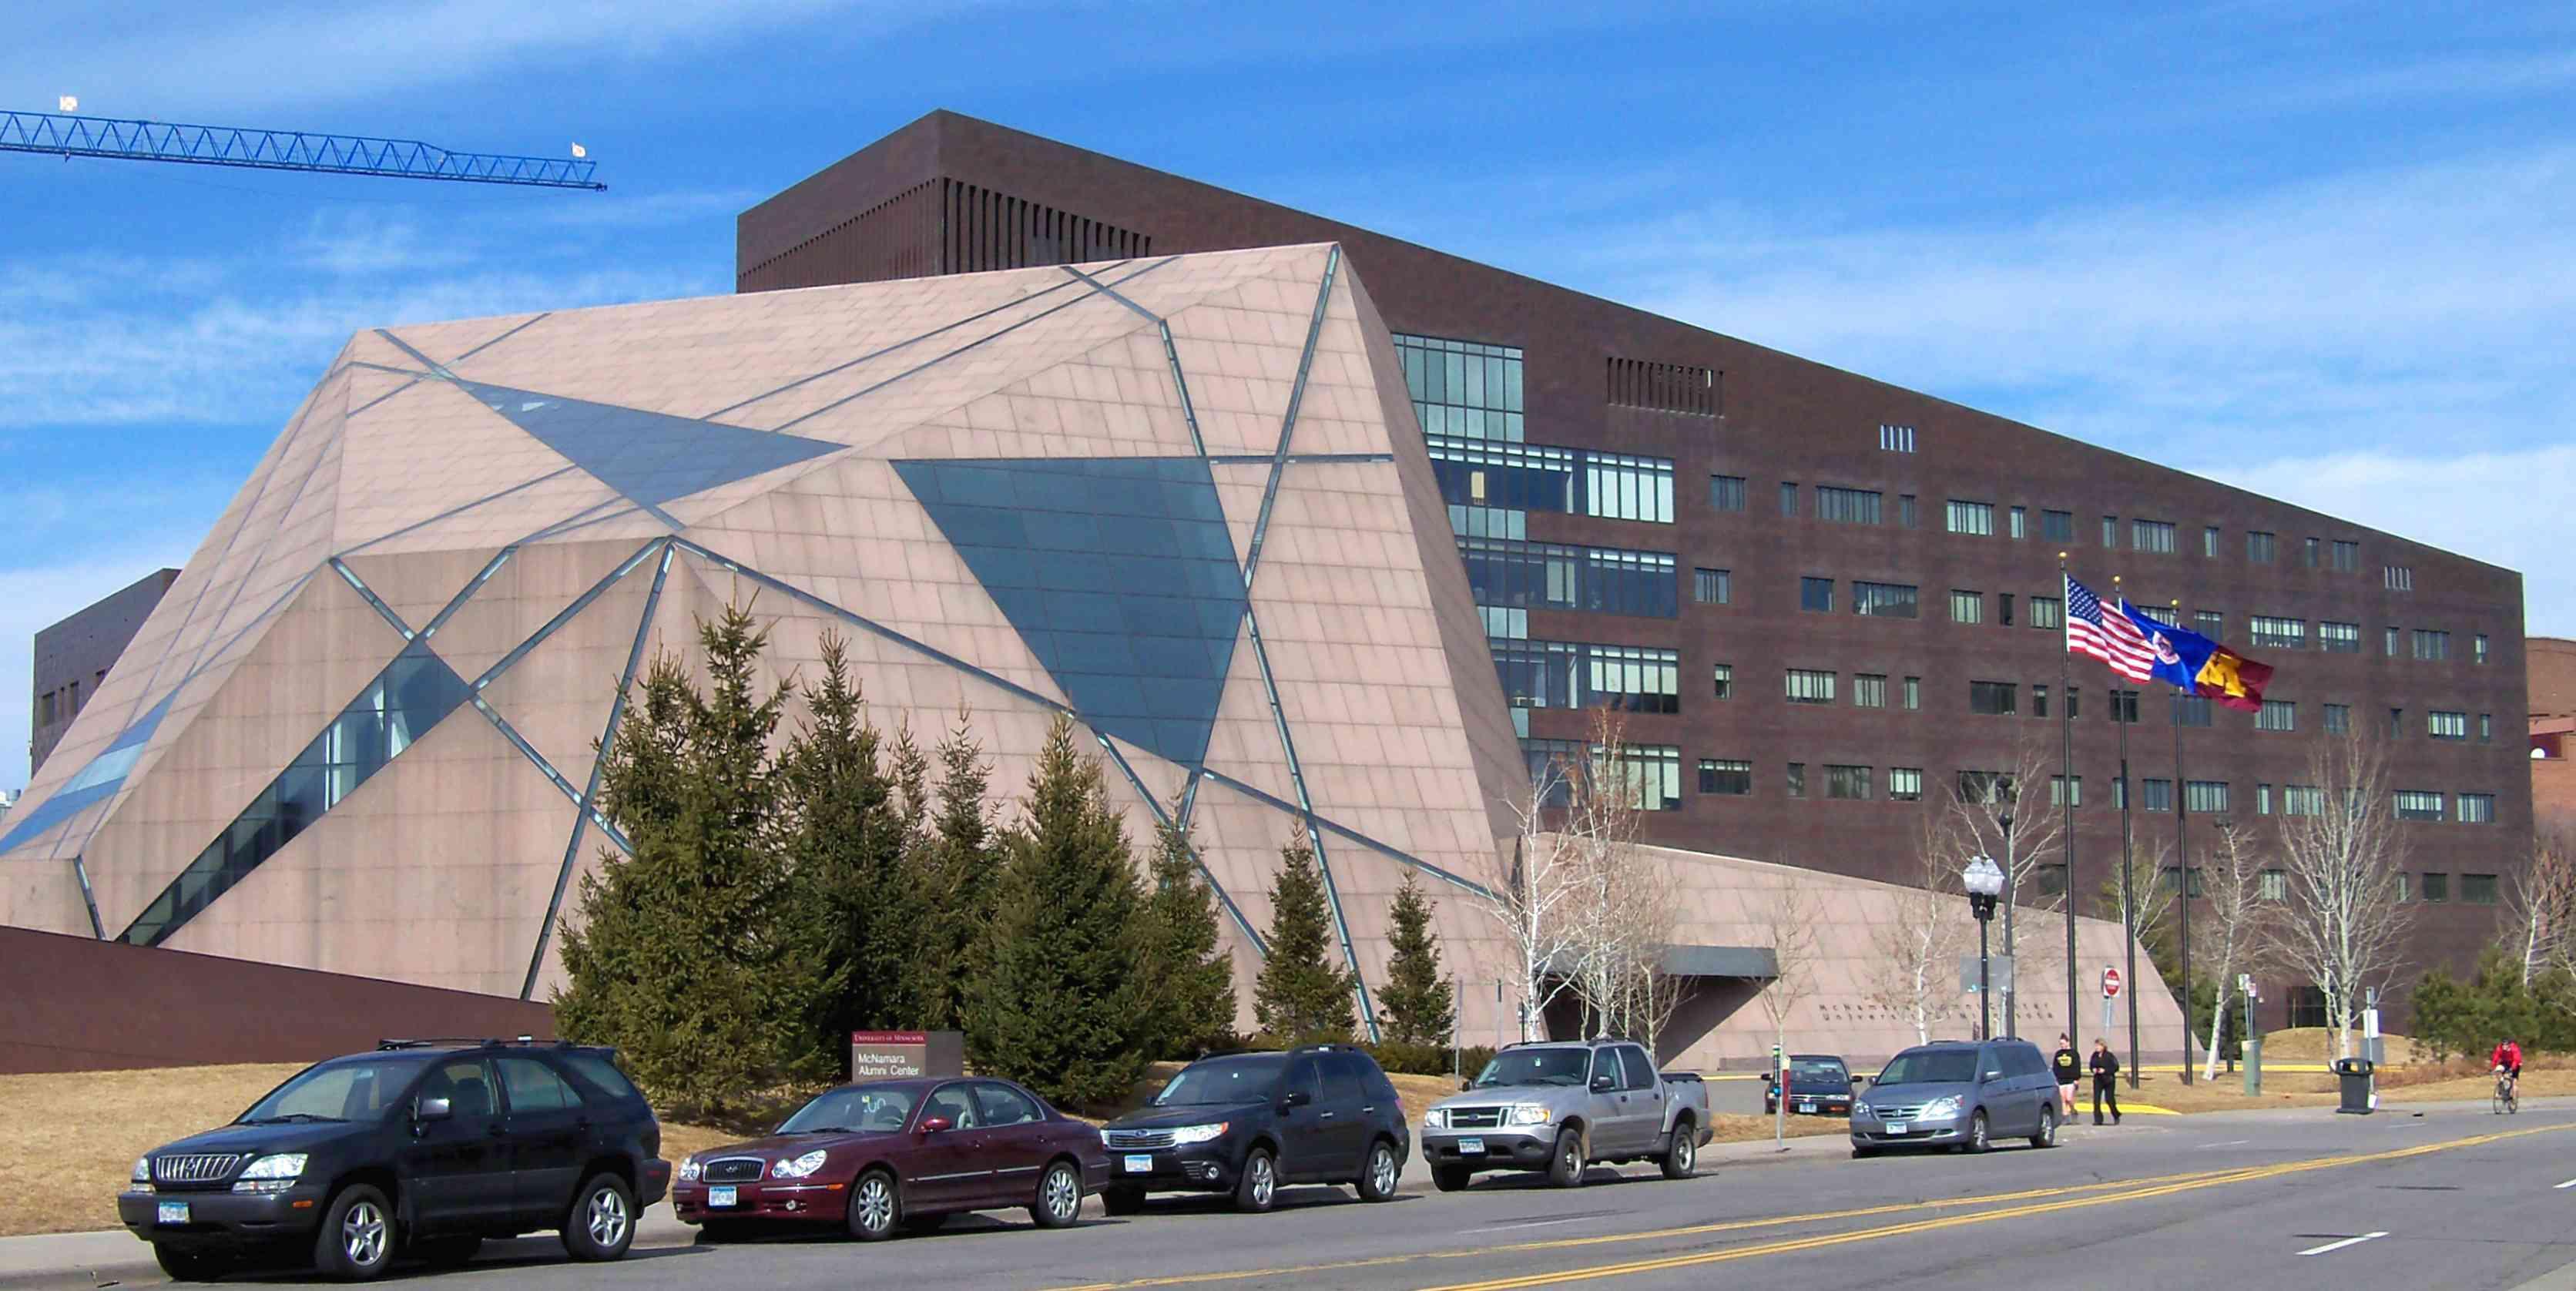 McNamara Alumni Center in Minneapolis